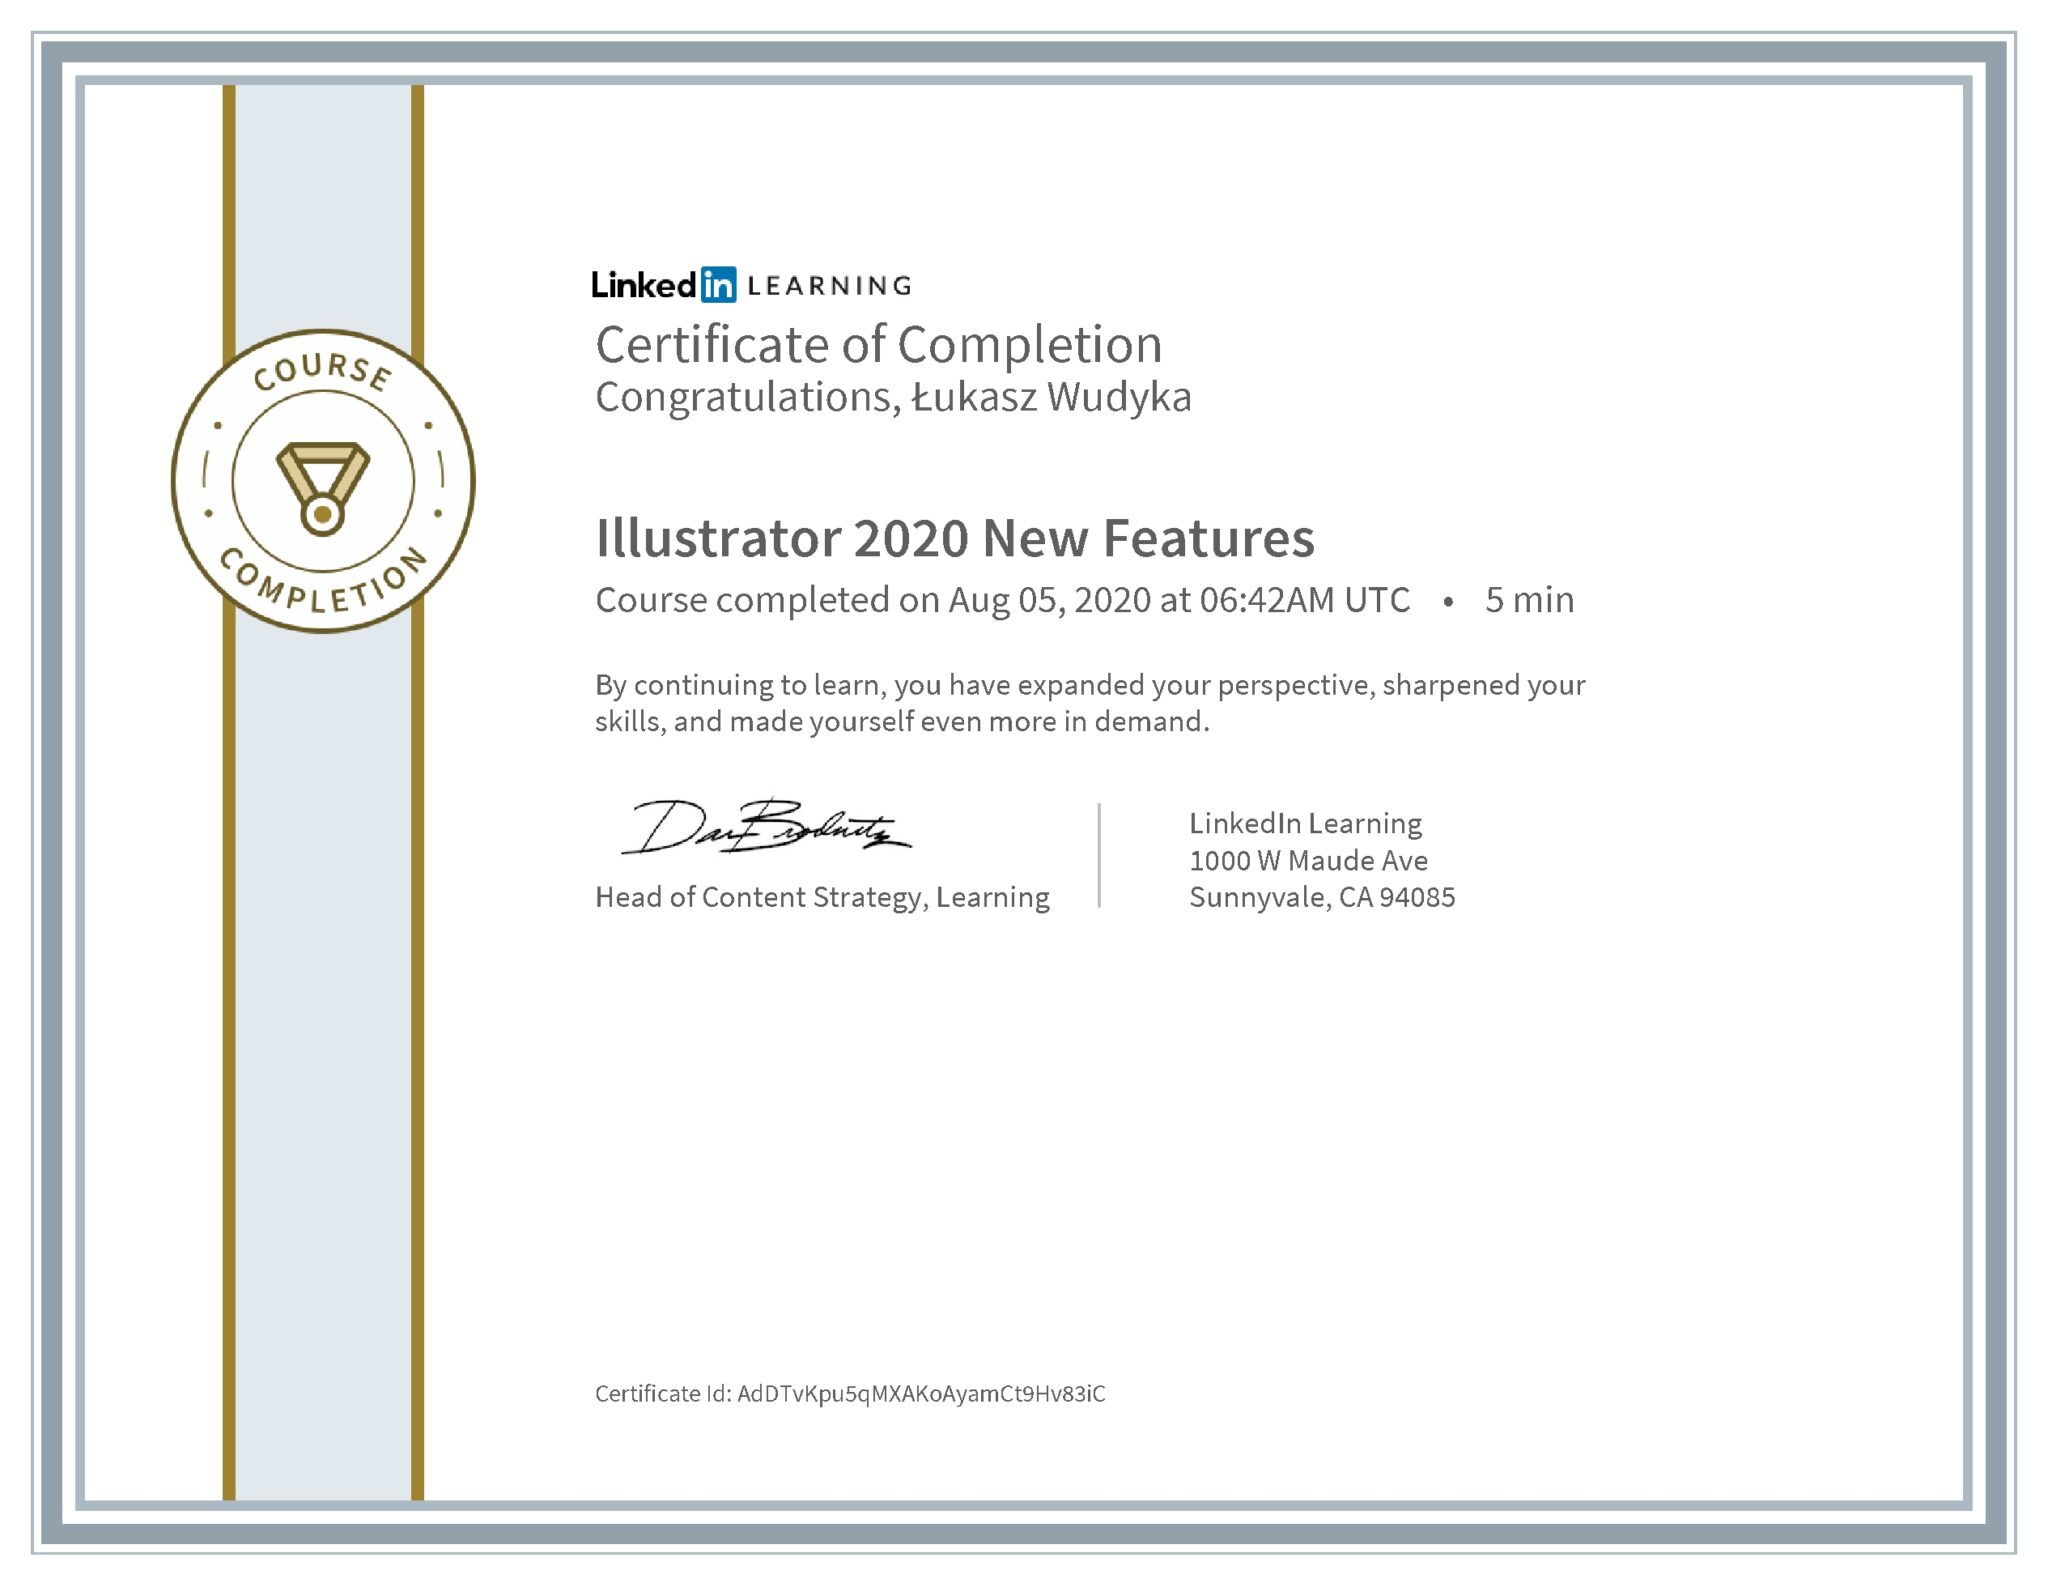 Łukasz Wudyka certyfikat LinkedIn Illustrator 2020 New Features